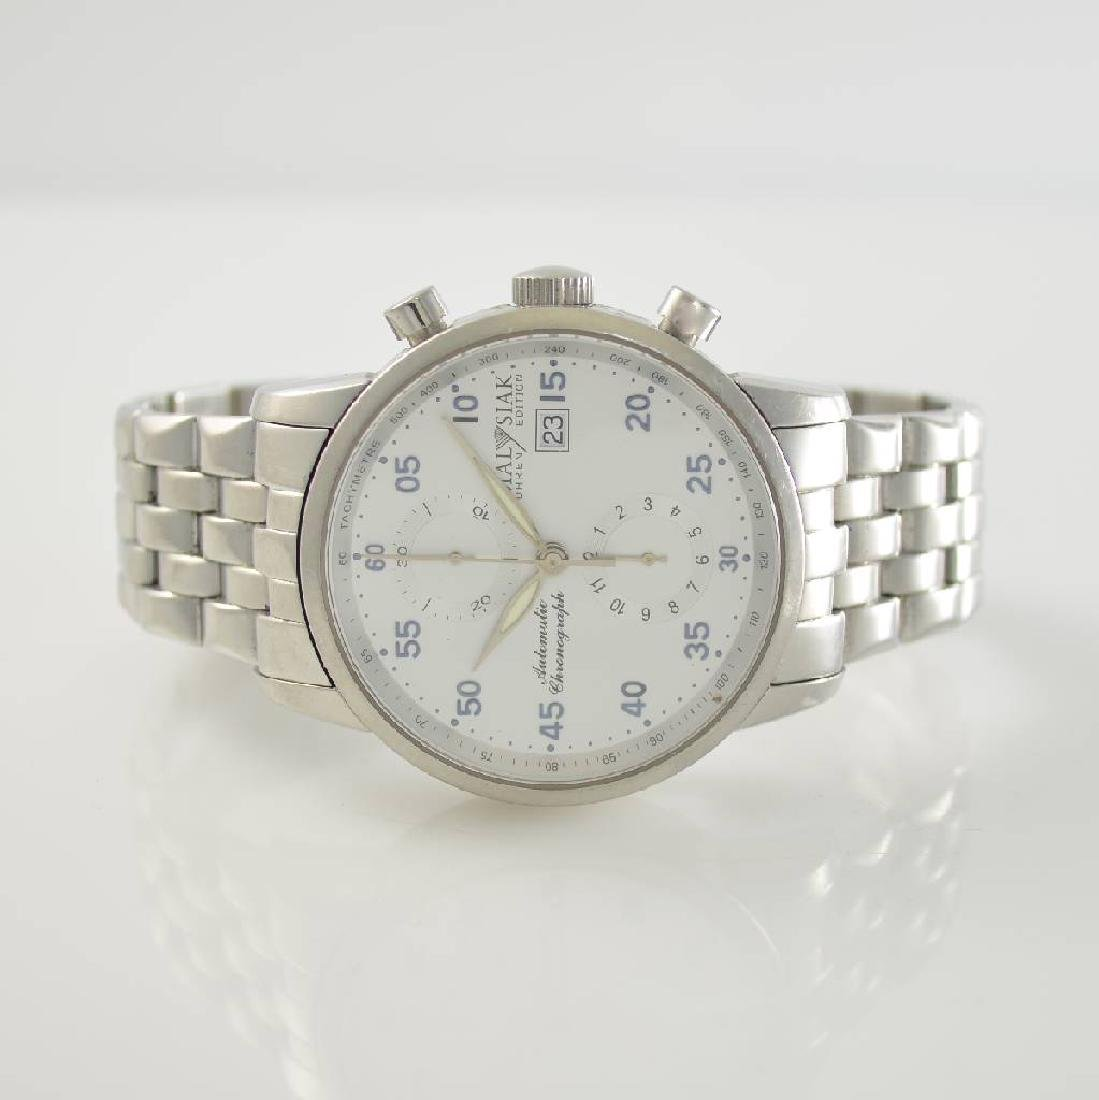 MALYSIAK Uhren Edition self winding chronograph